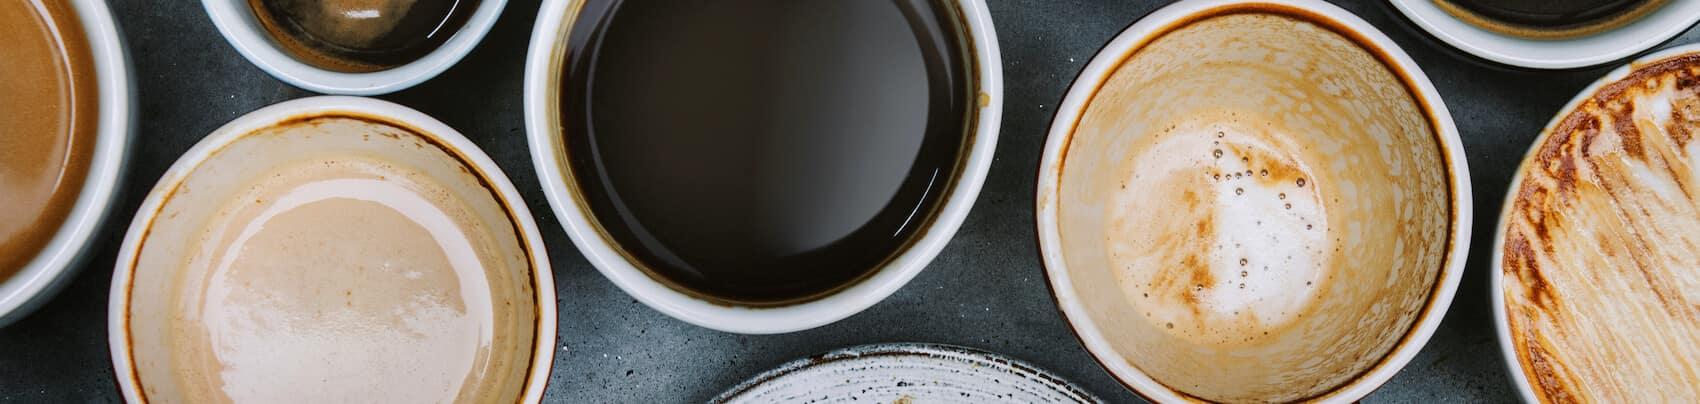 Jaho Coffee Roaster and Wine Bar